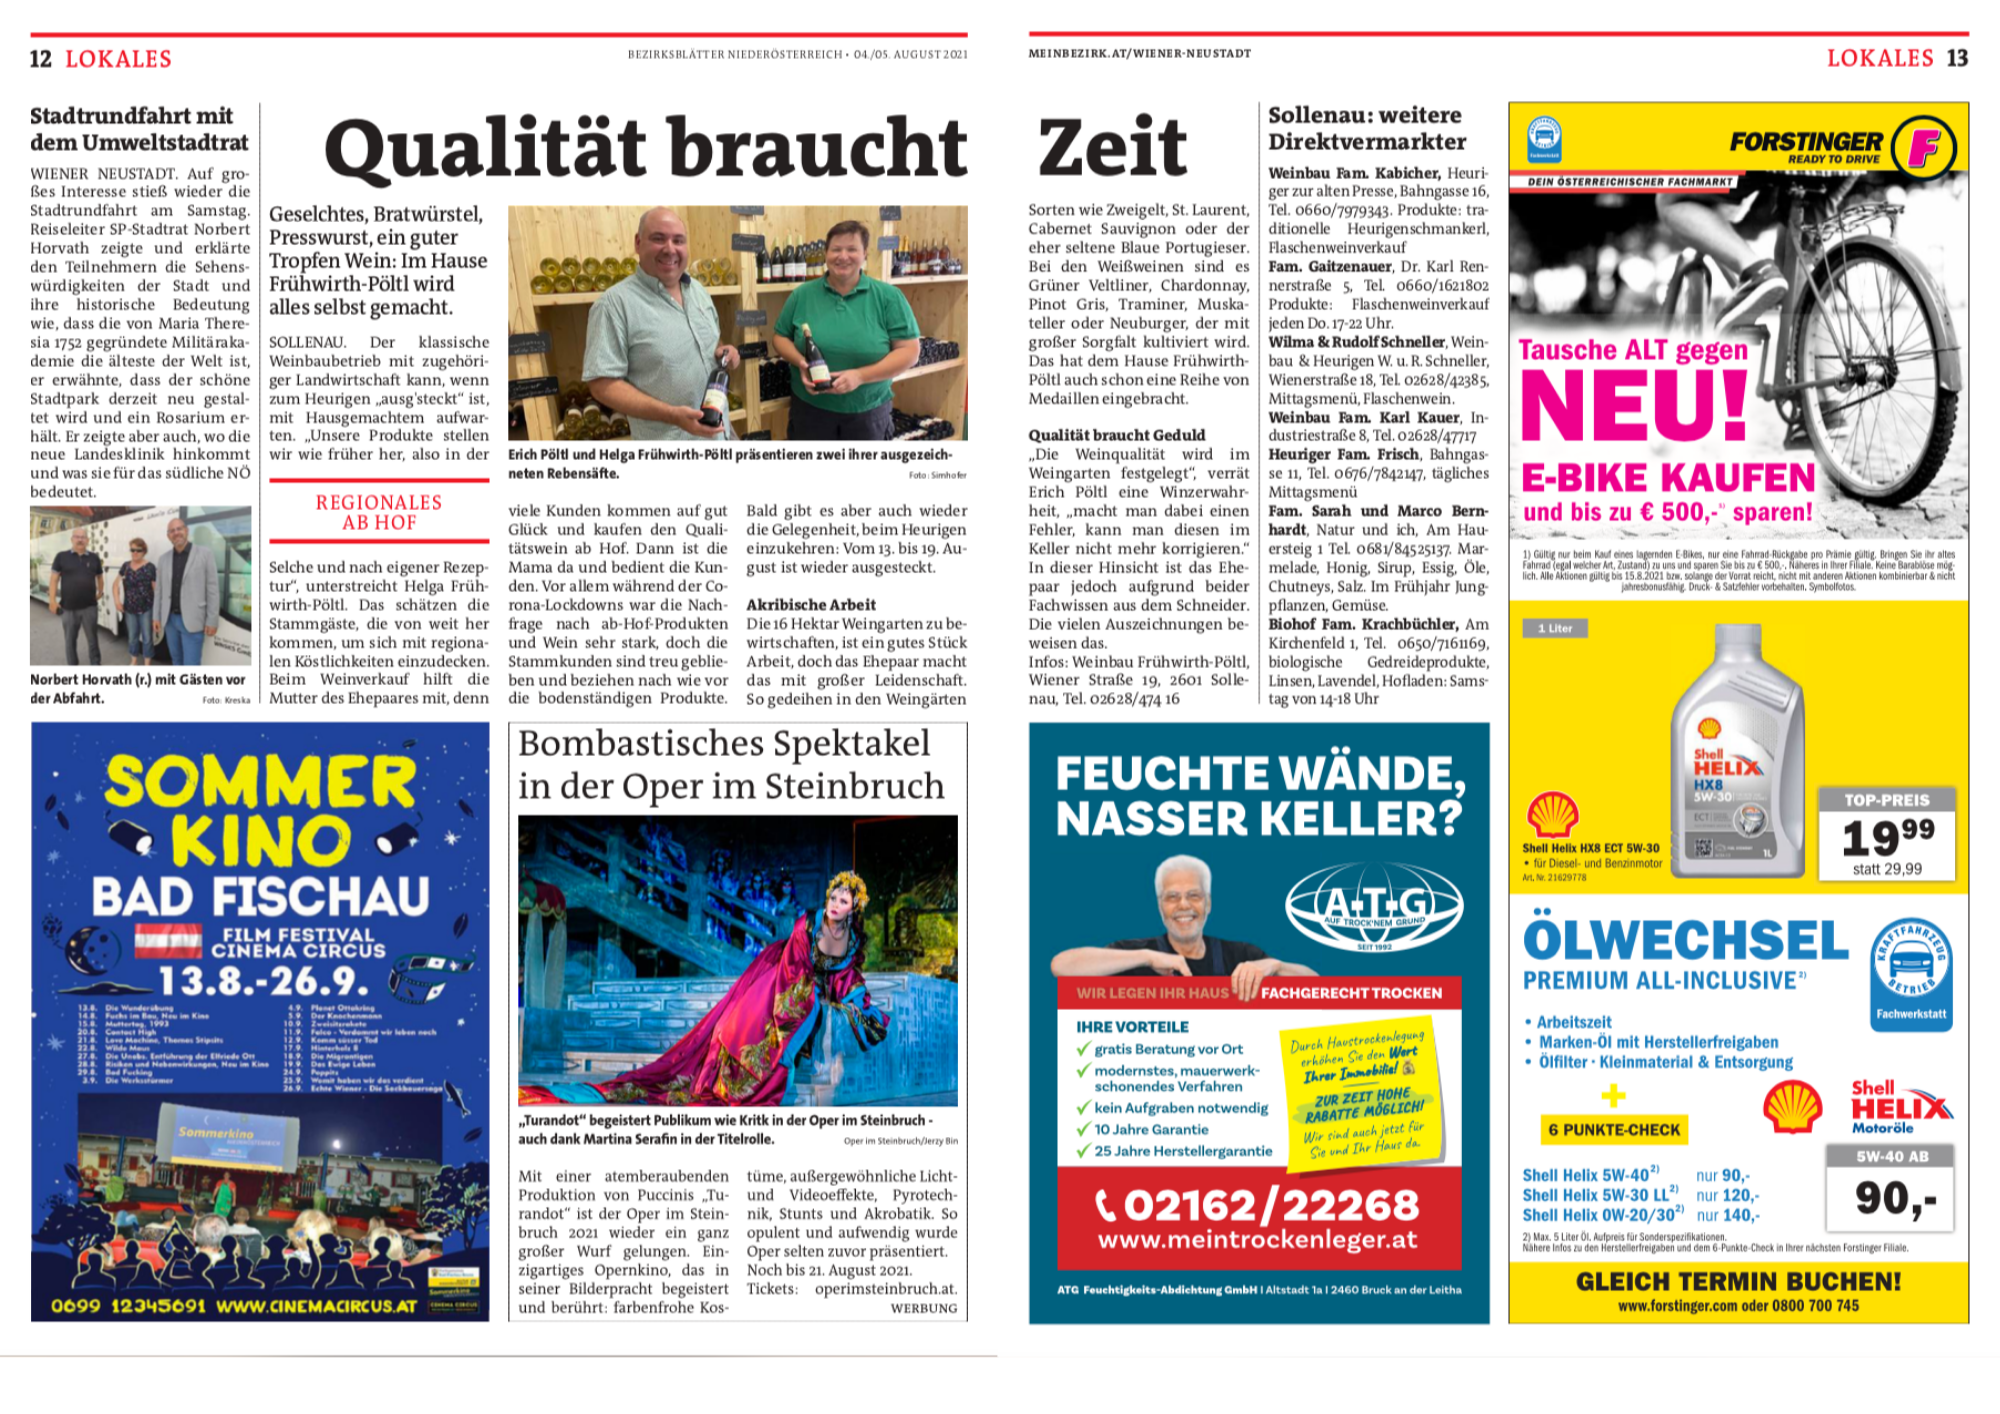 Bezirksblatt-Artikel-Serie-Direktvermarkter_Sollenau